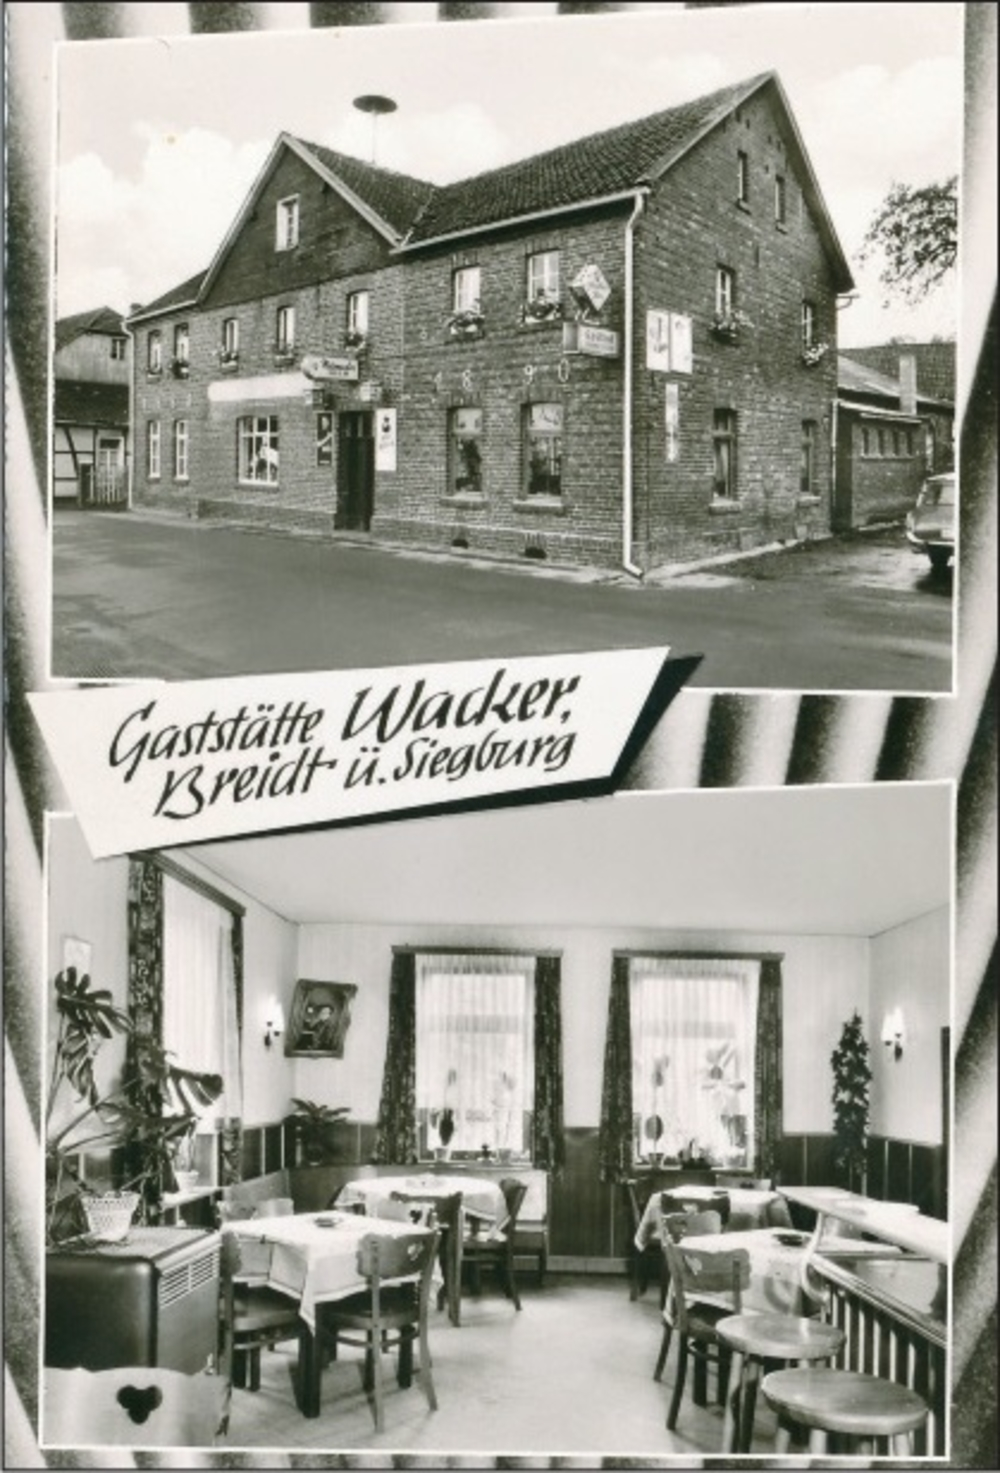 Gaststätte Wacker 1960er